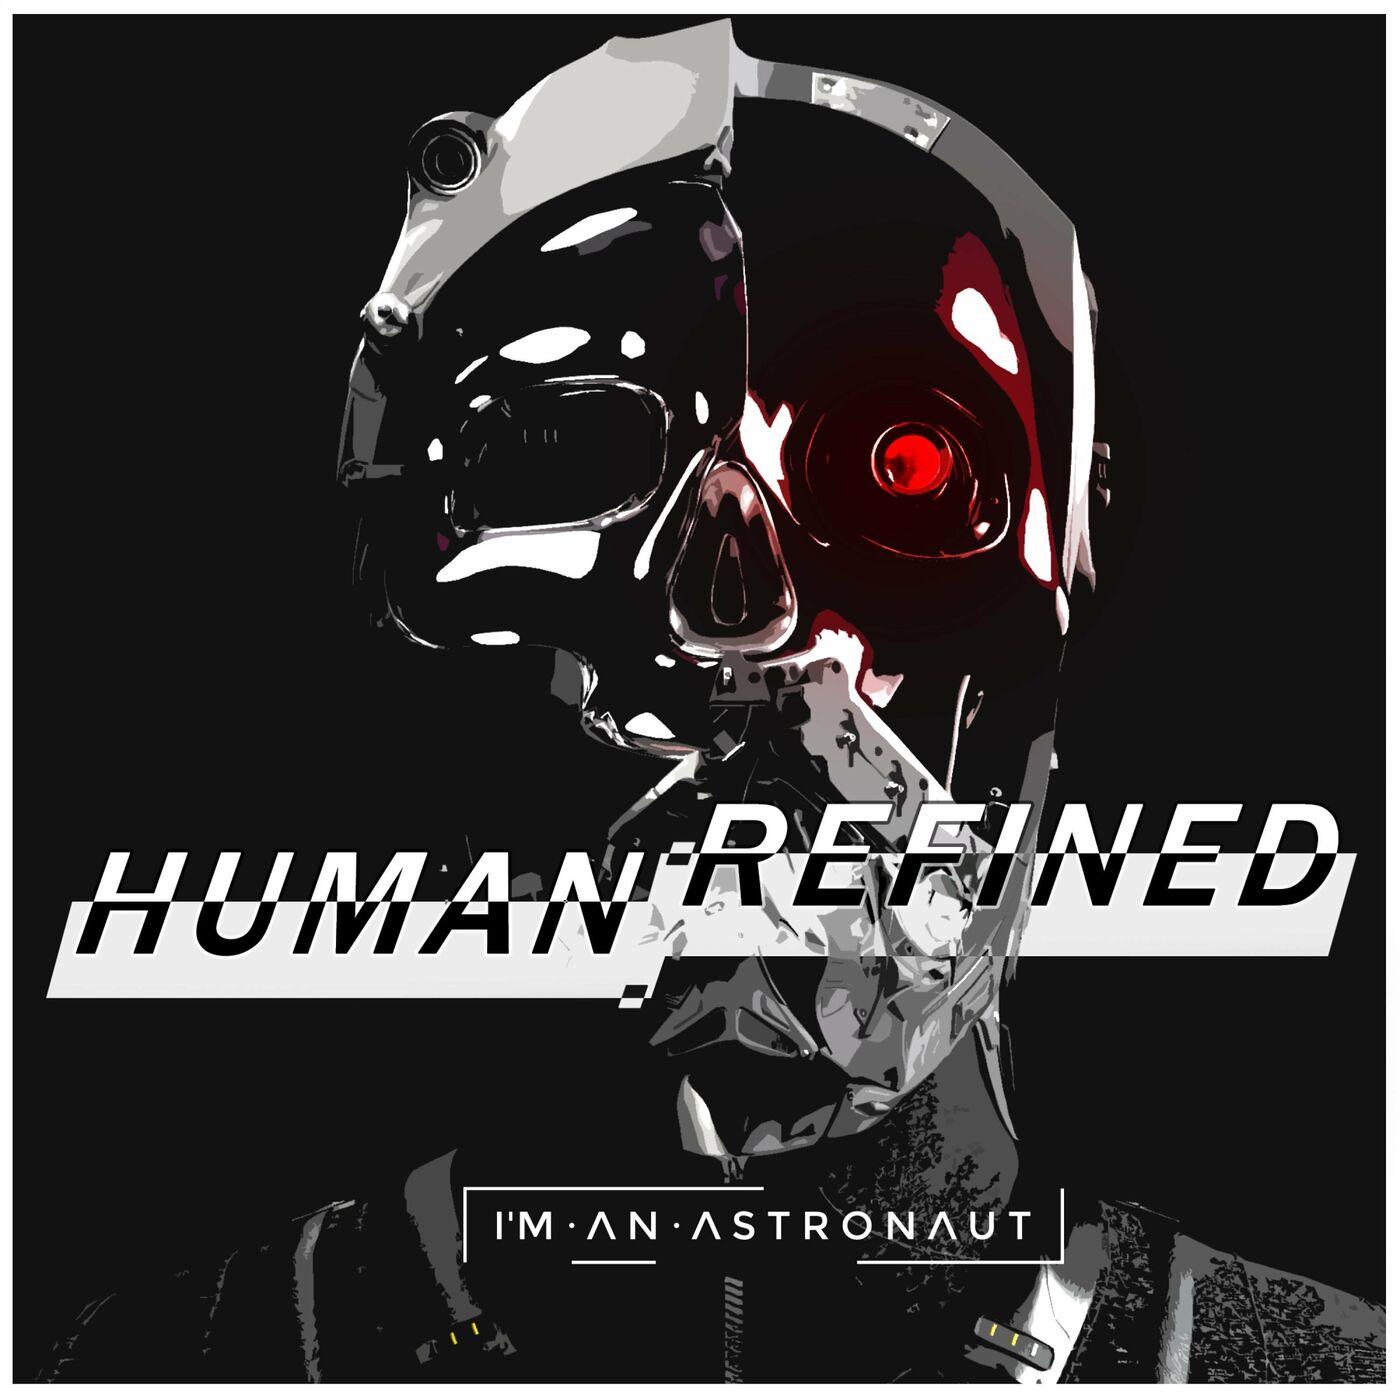 I'm An Astronaut - Human:Refined [single] (2020)